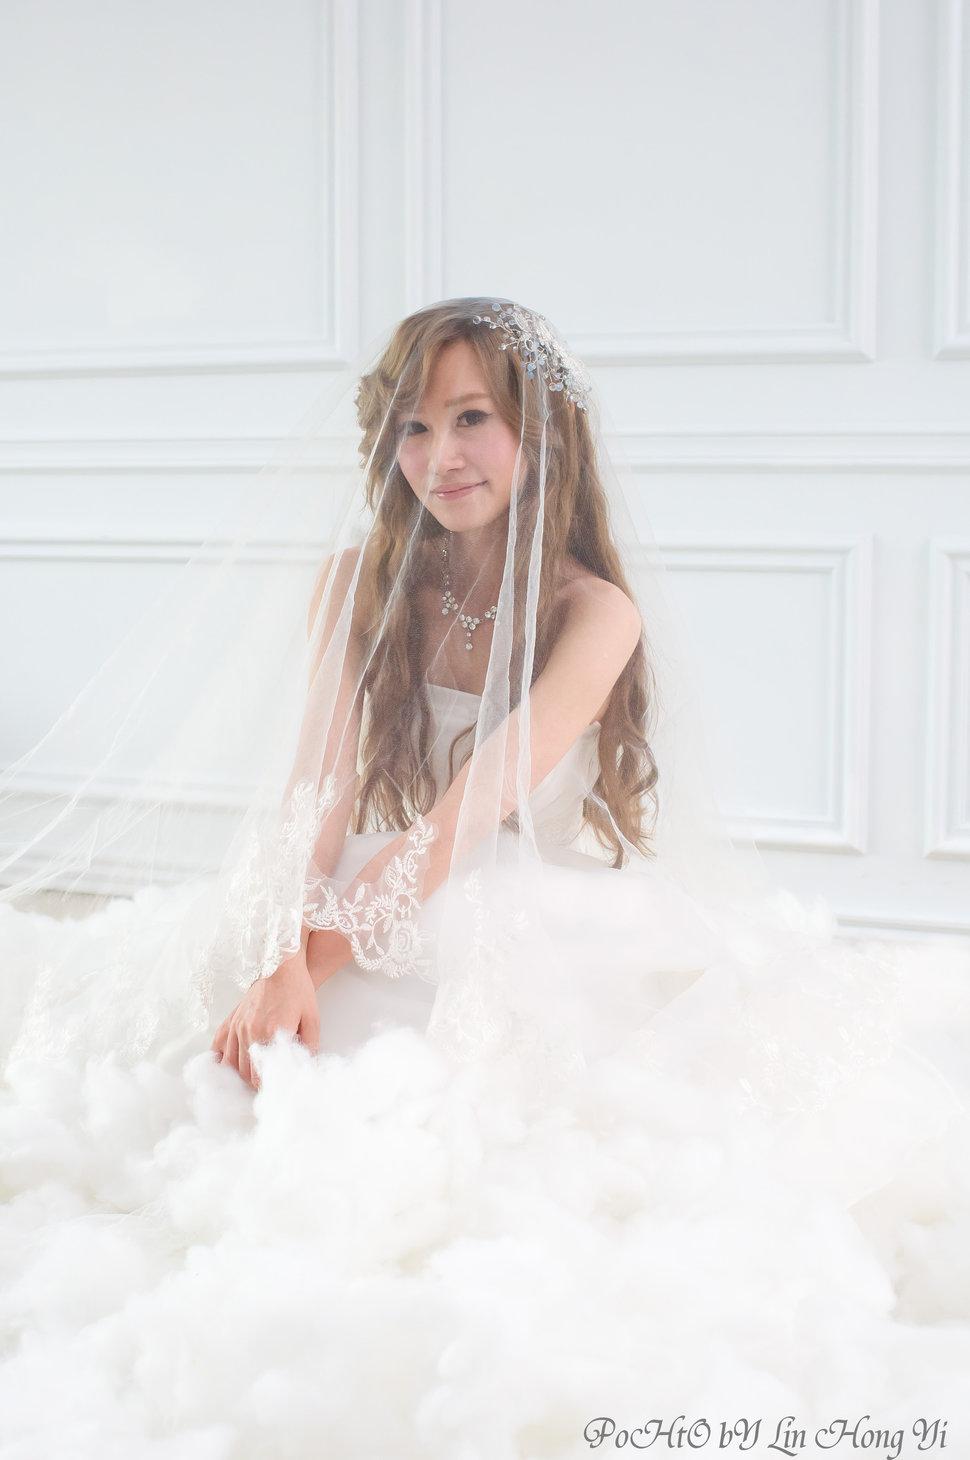 DSC_1228 - 小林哥Hung YI攝影工作室《結婚吧》